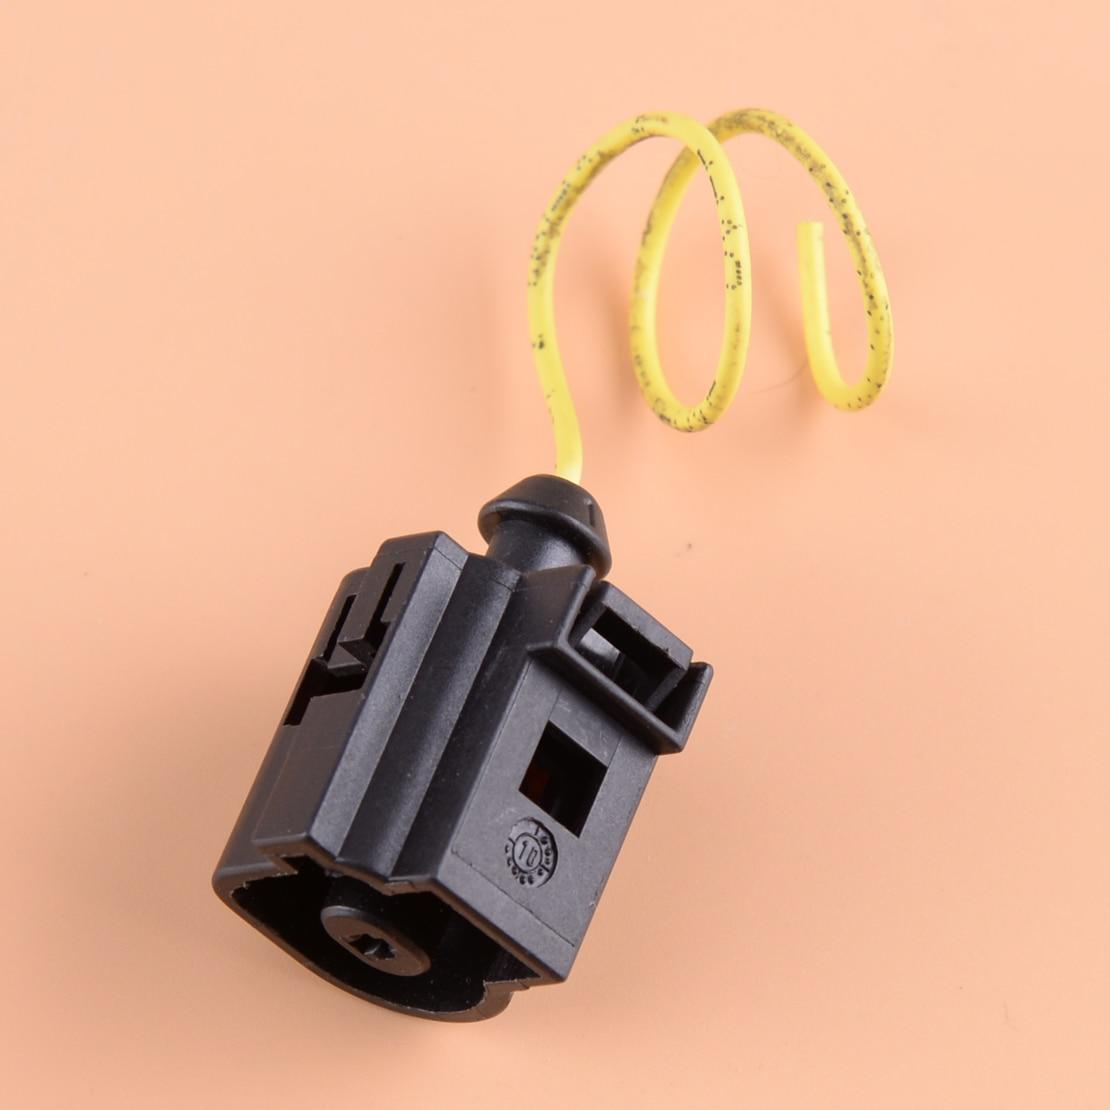 Conector automático cigall de 1 clavija Sensor de presión de aceite enchufe adaptador de arnés de cableado apto para VW Golf Jetta 1J0973081